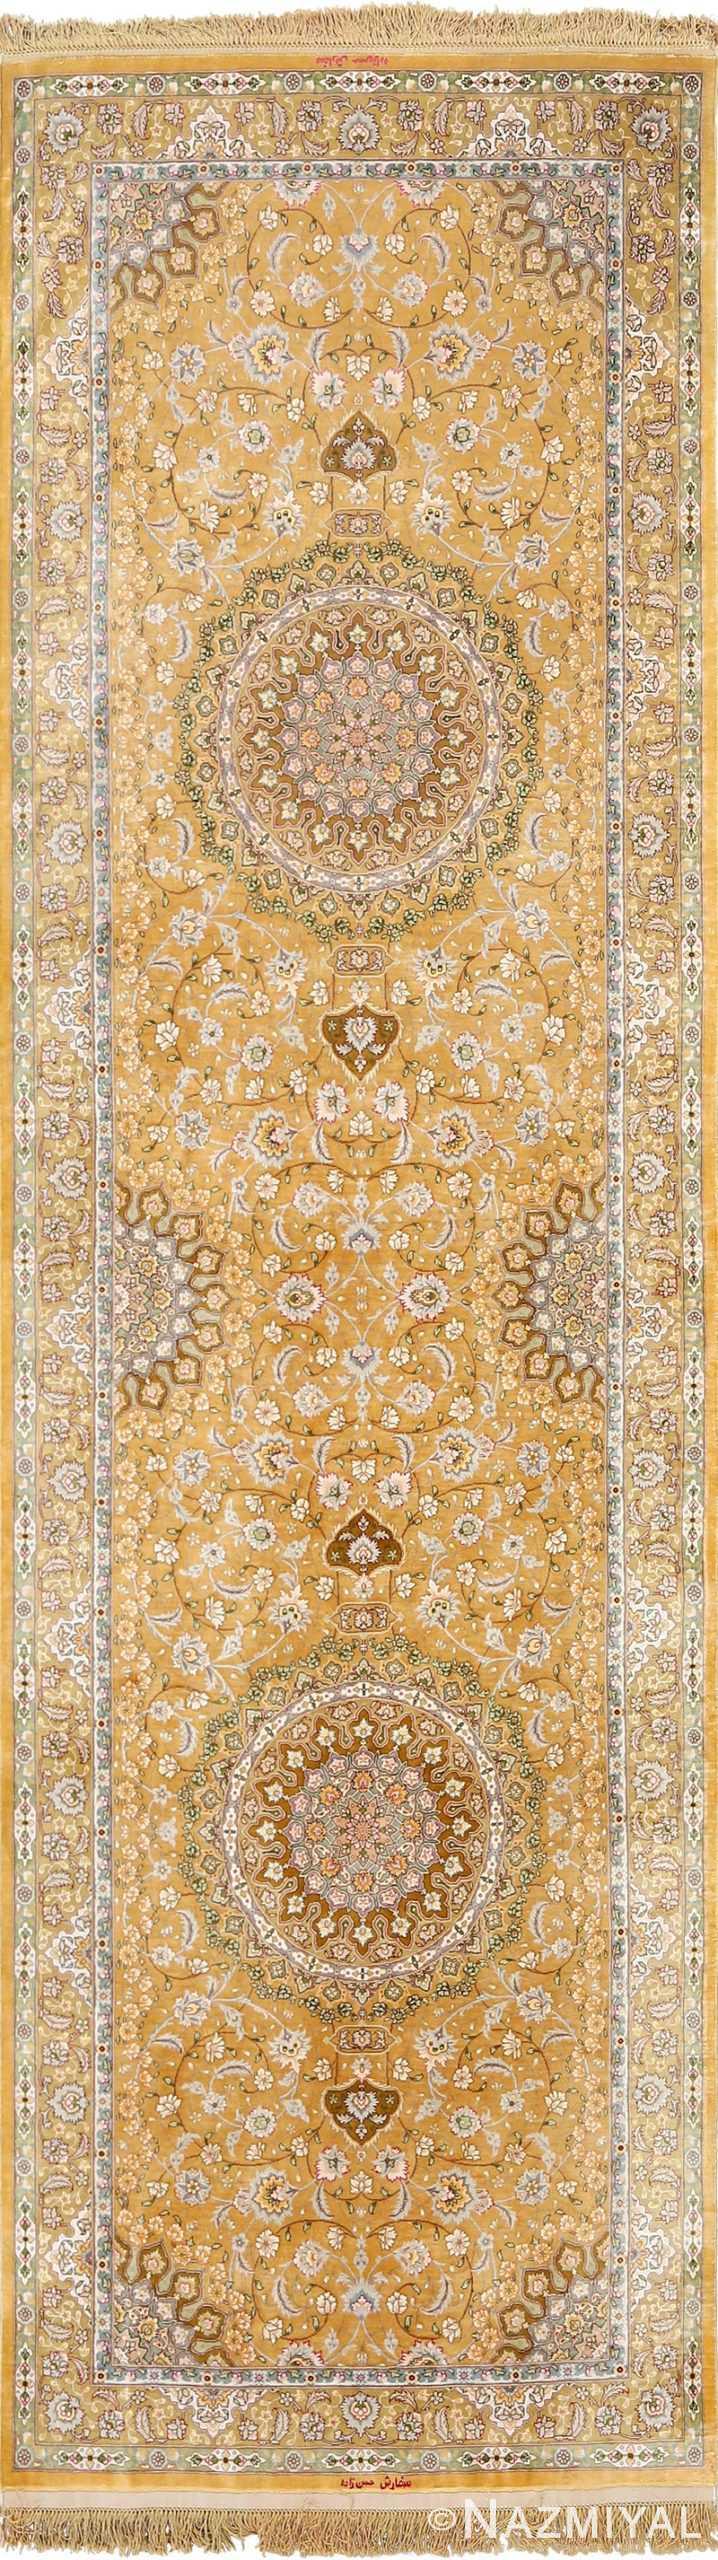 fine shahsavarpour design vintage tabriz persian rug 51044 Nazmiyal